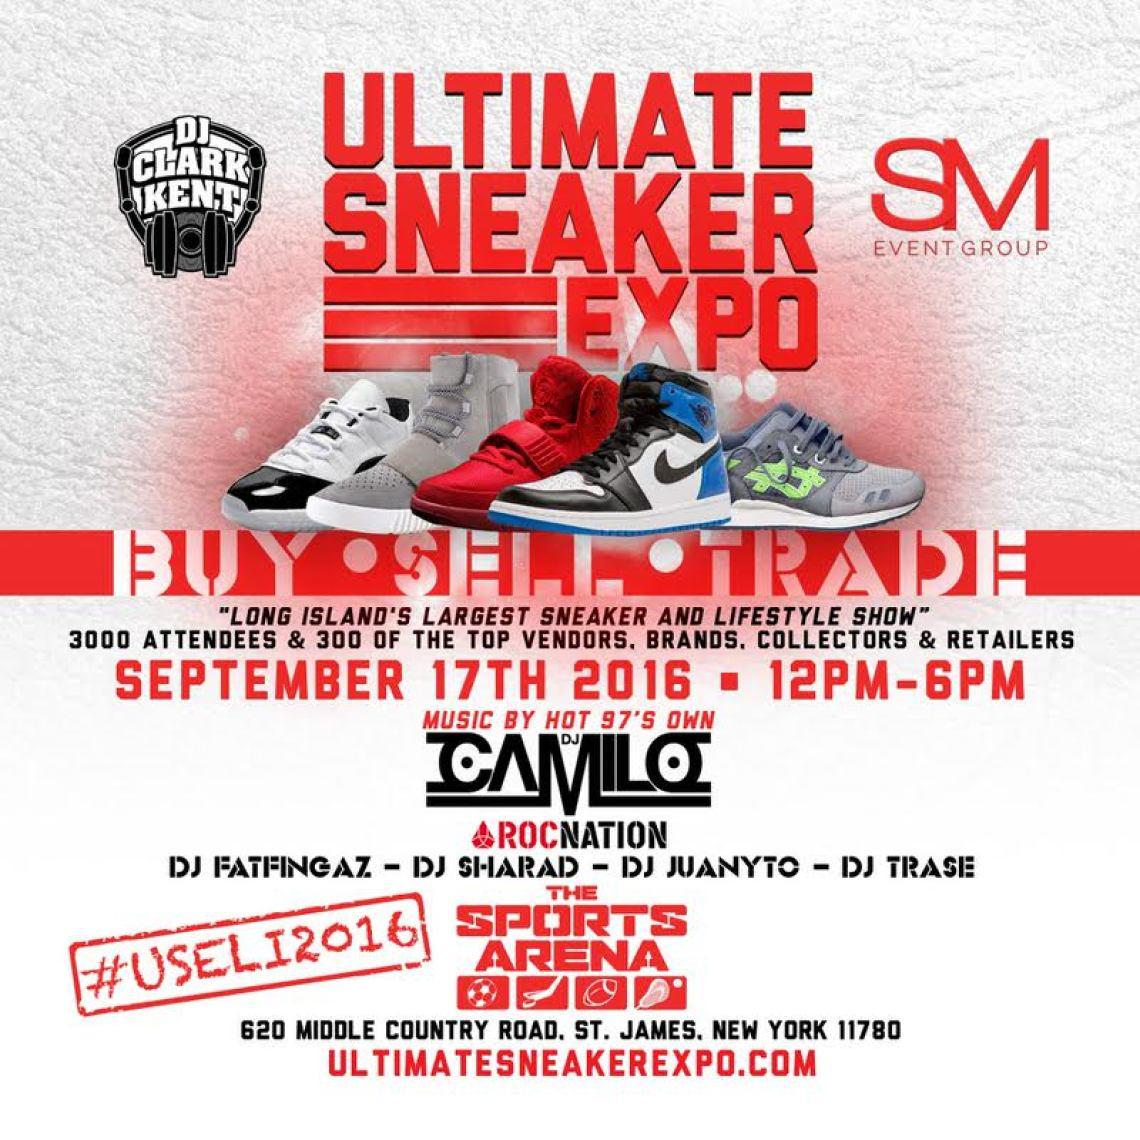 Ultimate Sneaker Expo